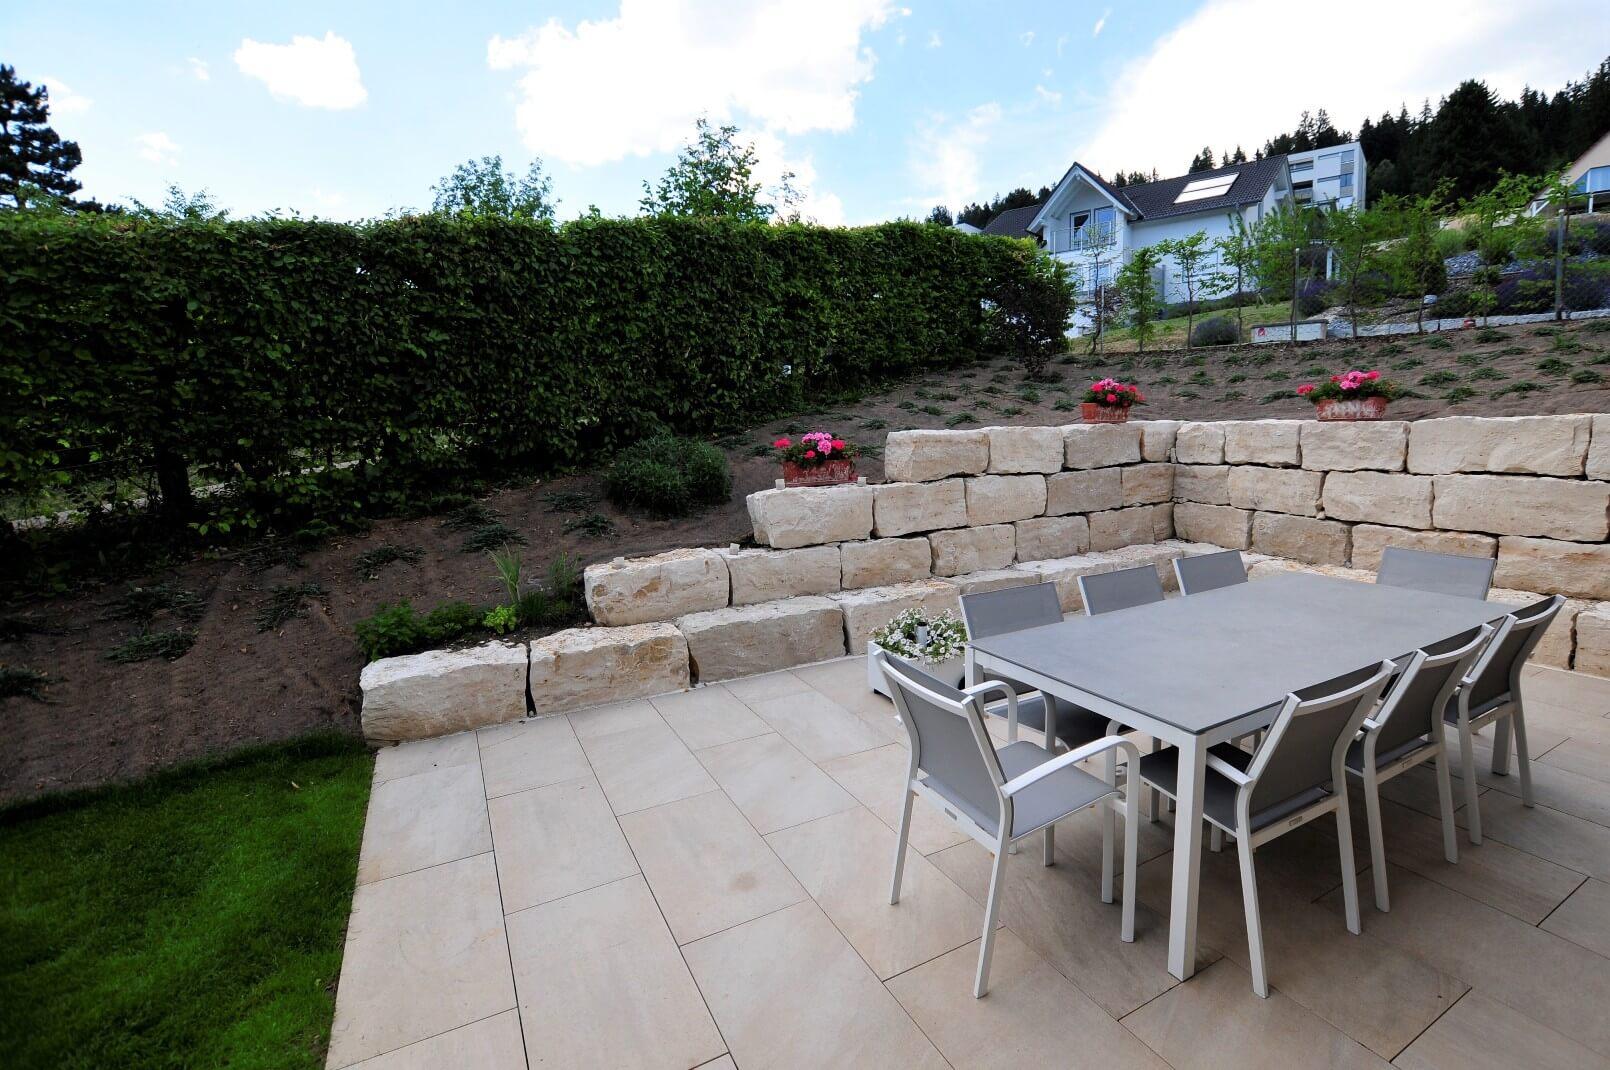 paysagiste tramelan villa terrasse jardin mur en pierres calcaires aellig paysages (8)